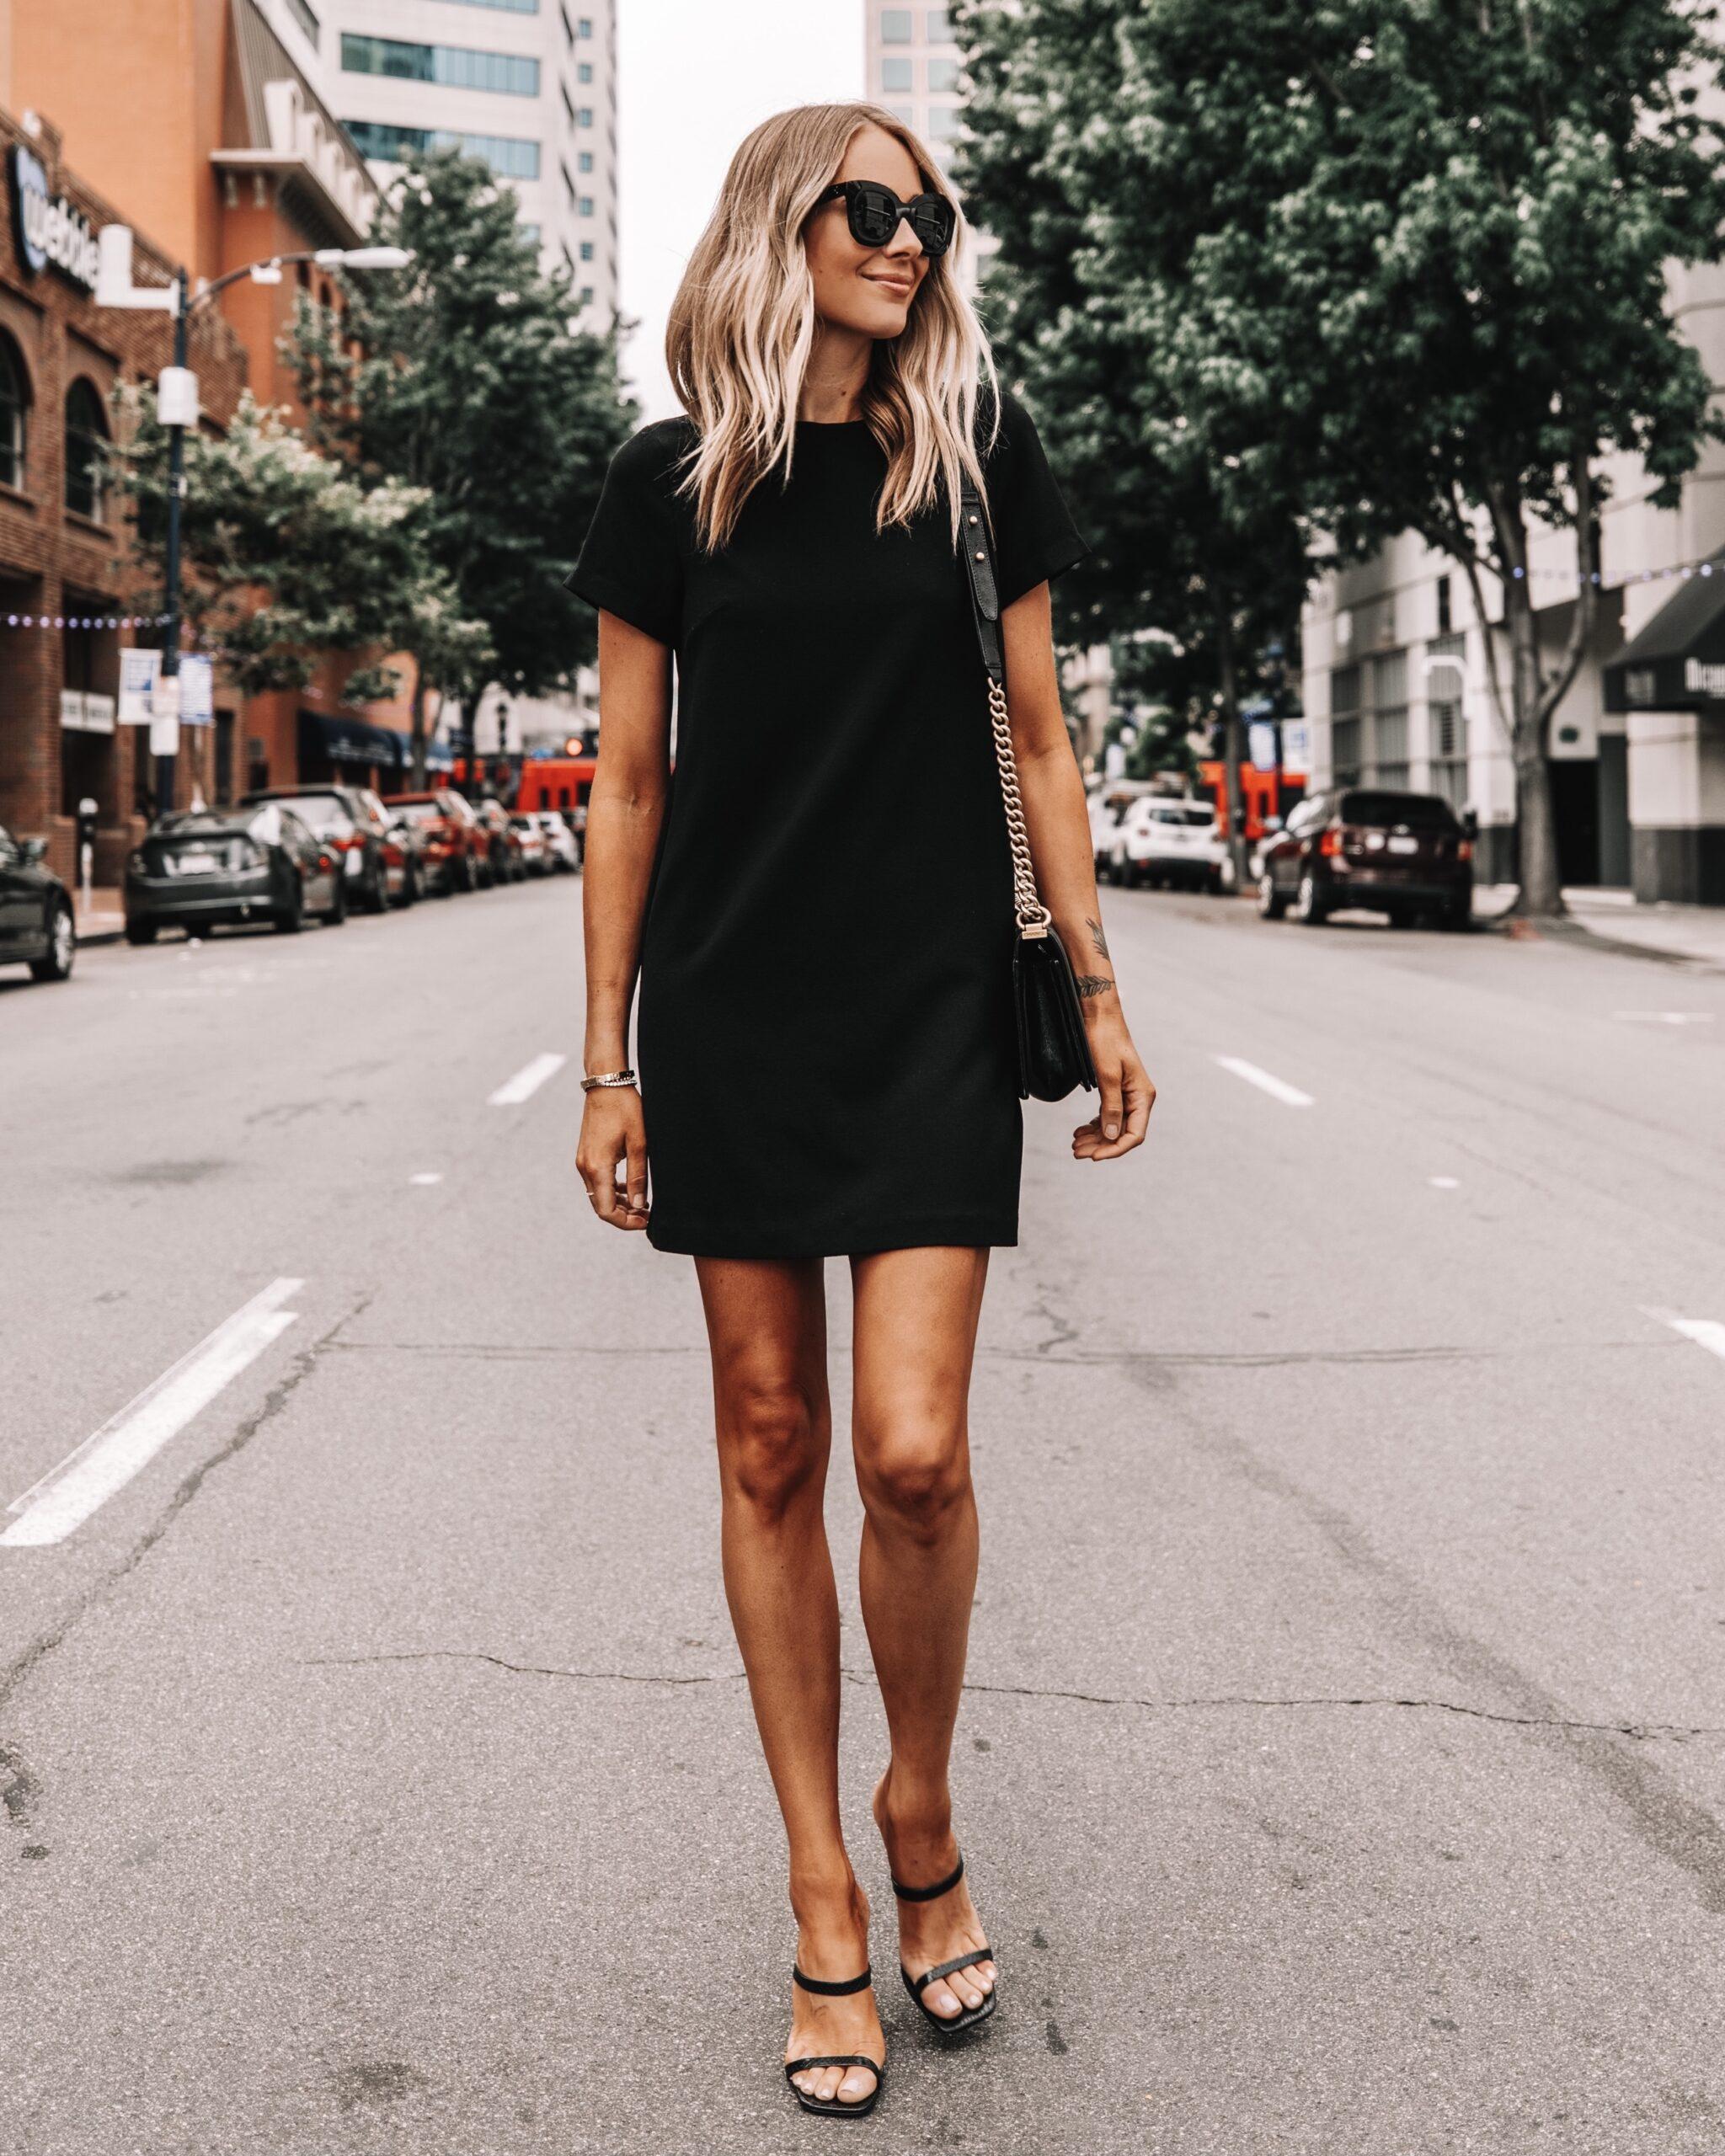 Fashion Jackson Wearing Black Shift Dress Black Heeled Sandals